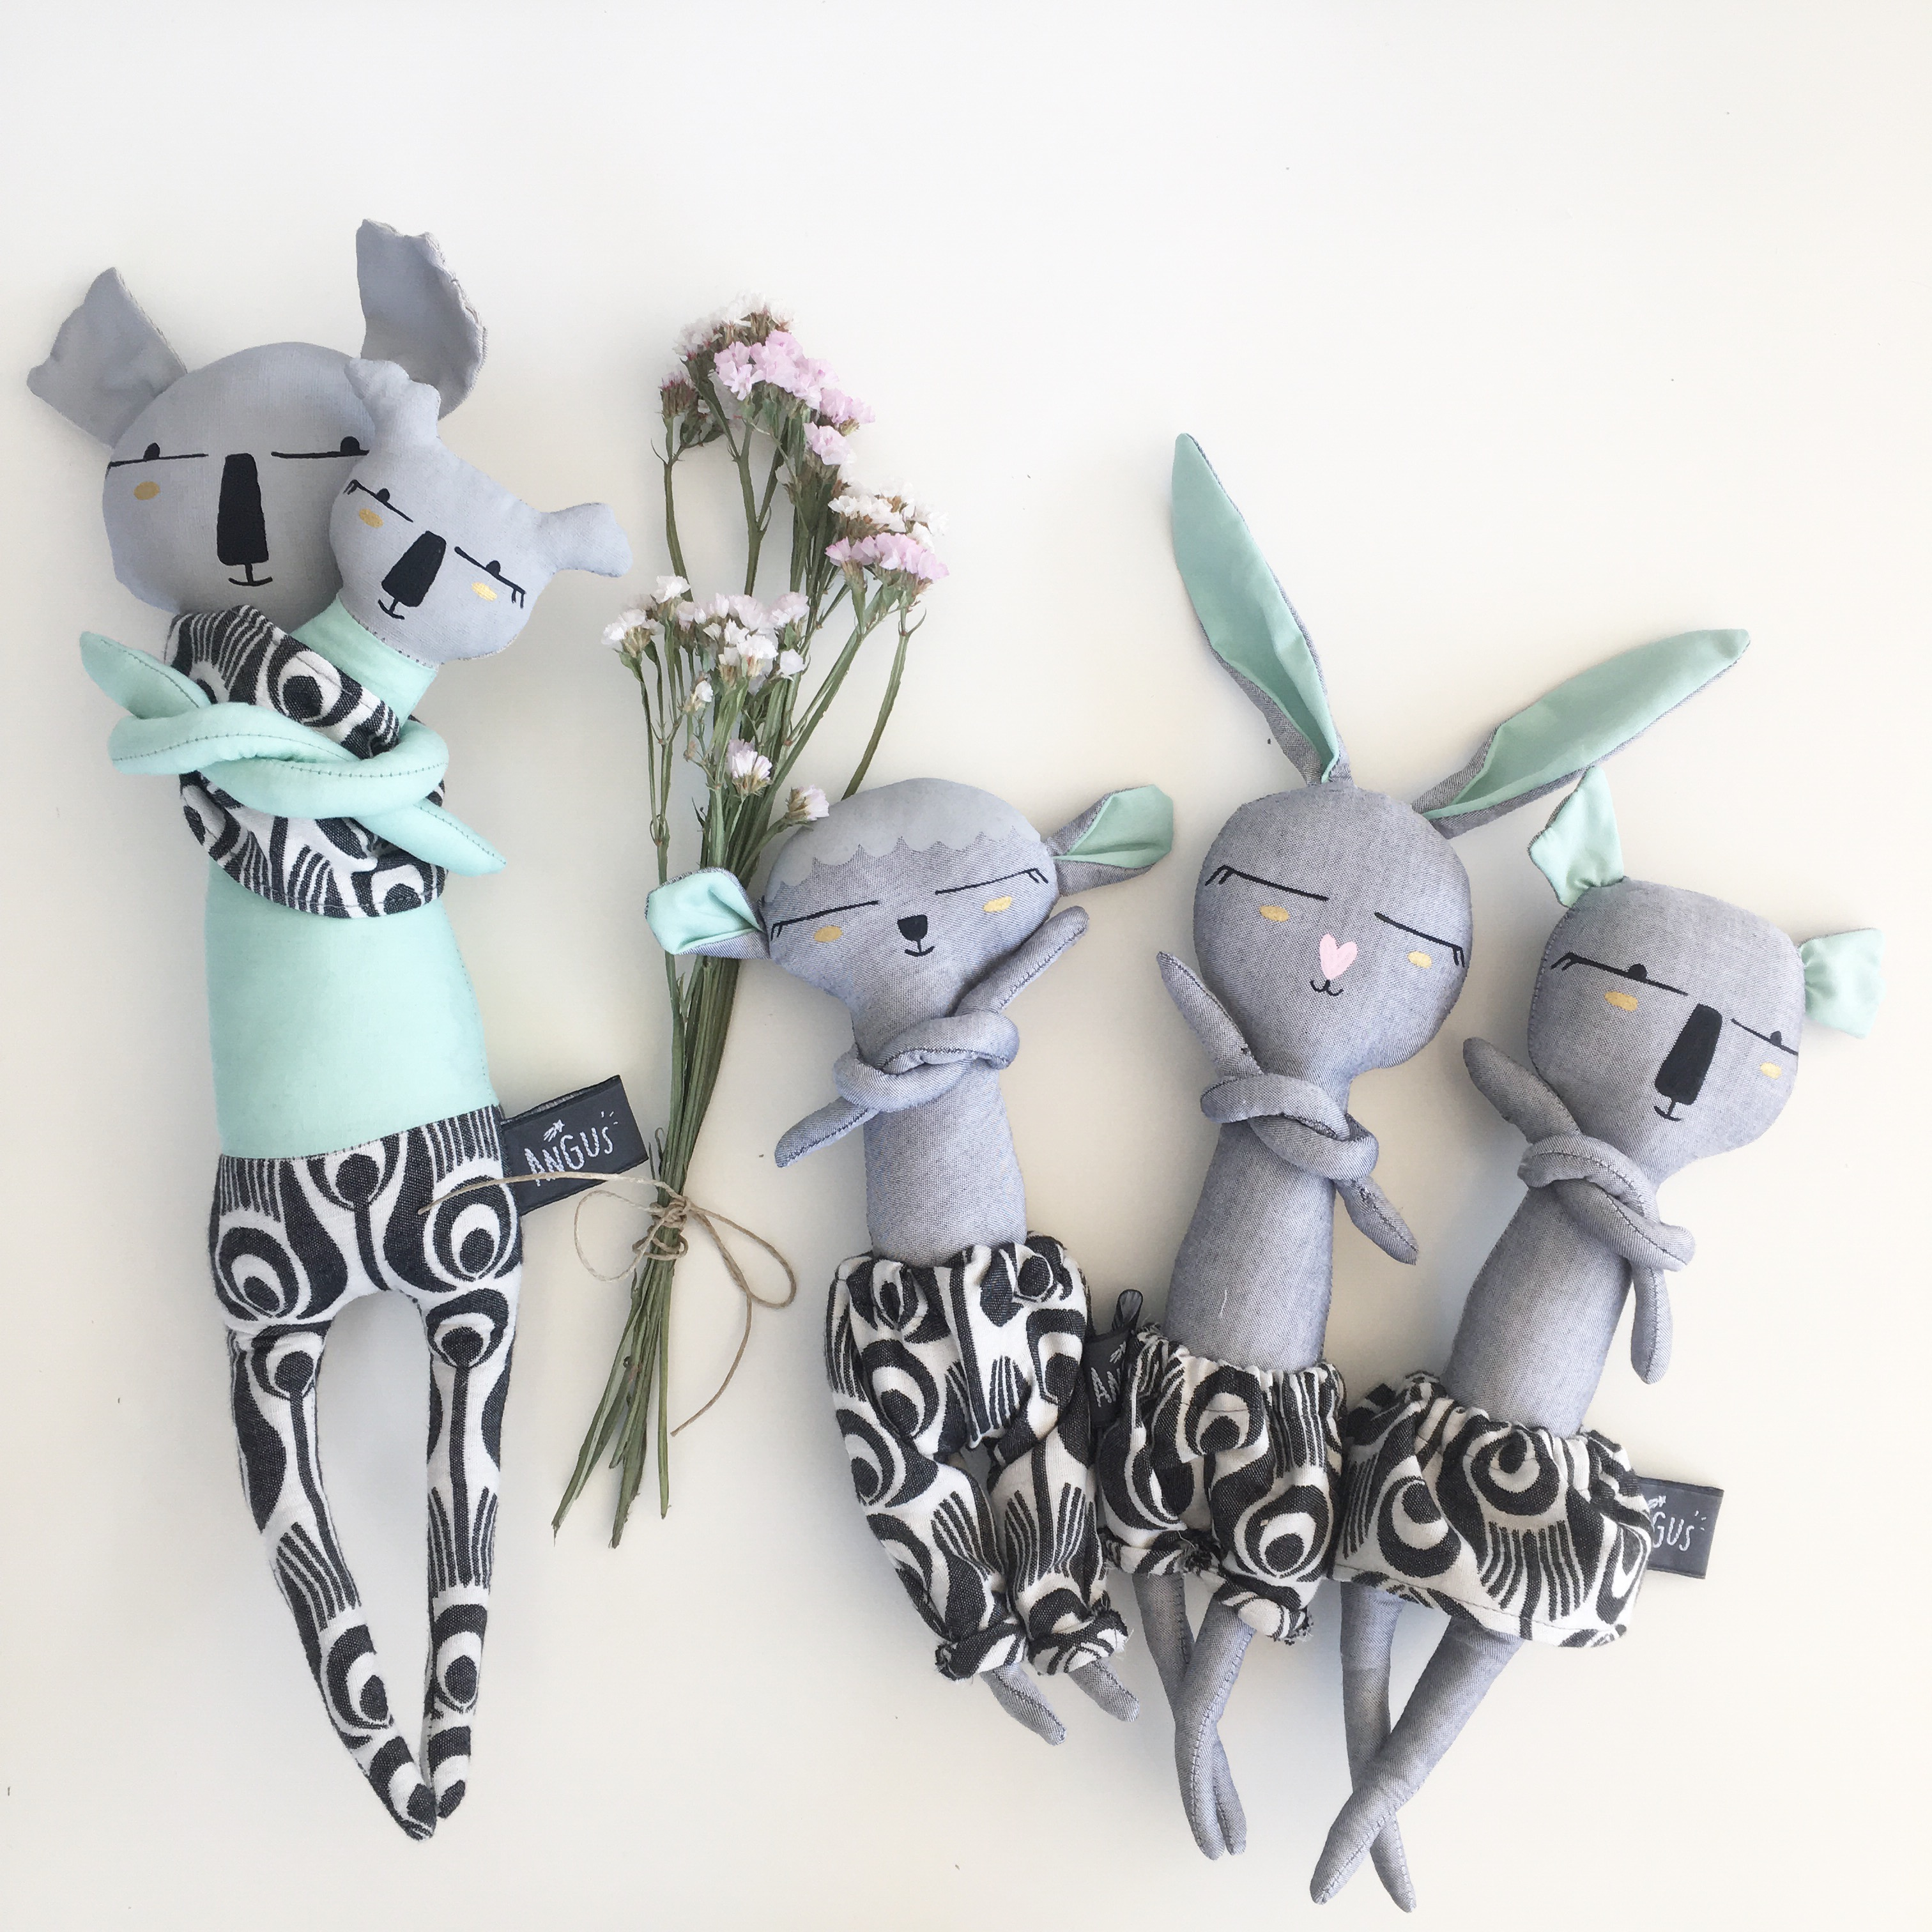 jolies dolls nova atelier angus